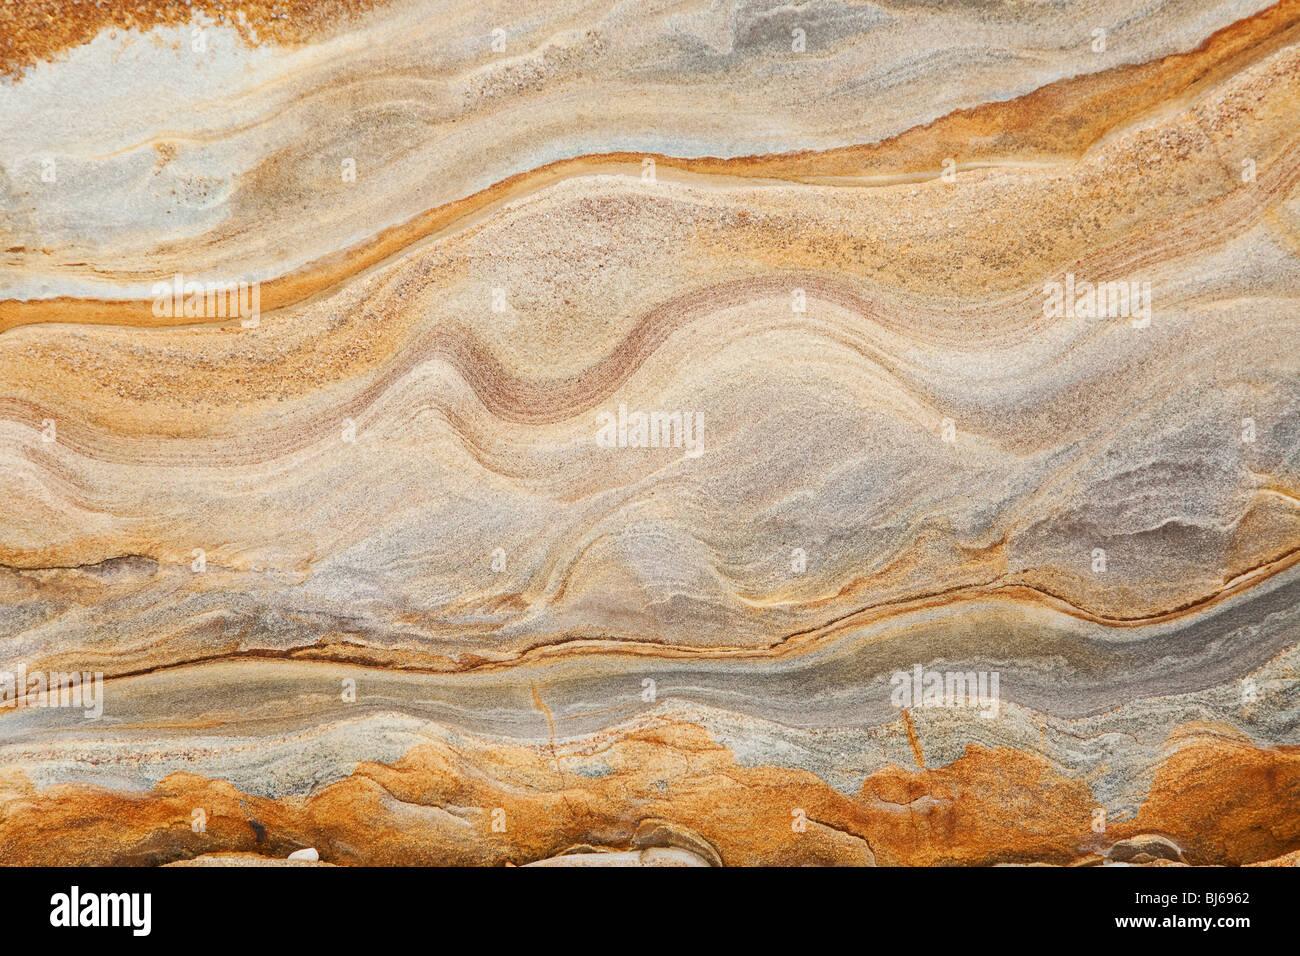 sedimentary rock sandstone background - Stock Image